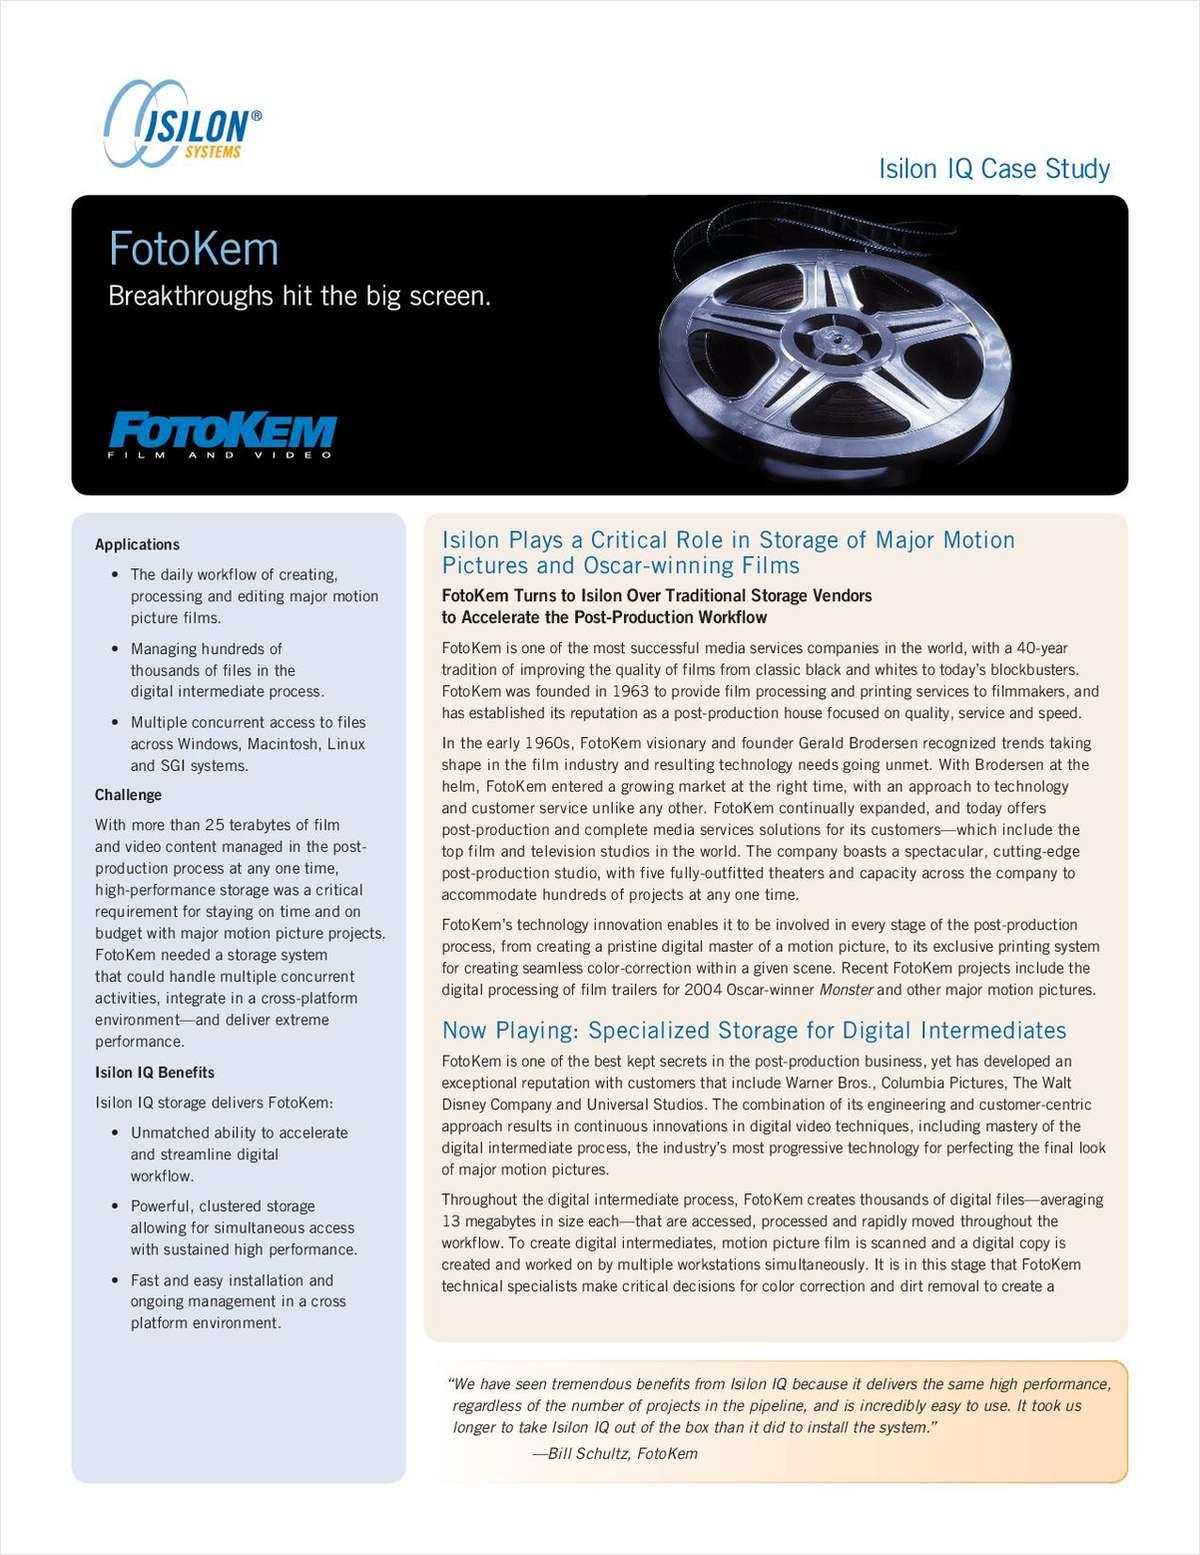 Isilon IQ Case Study: FotoKem Breakthroughs Hit the Big Screen